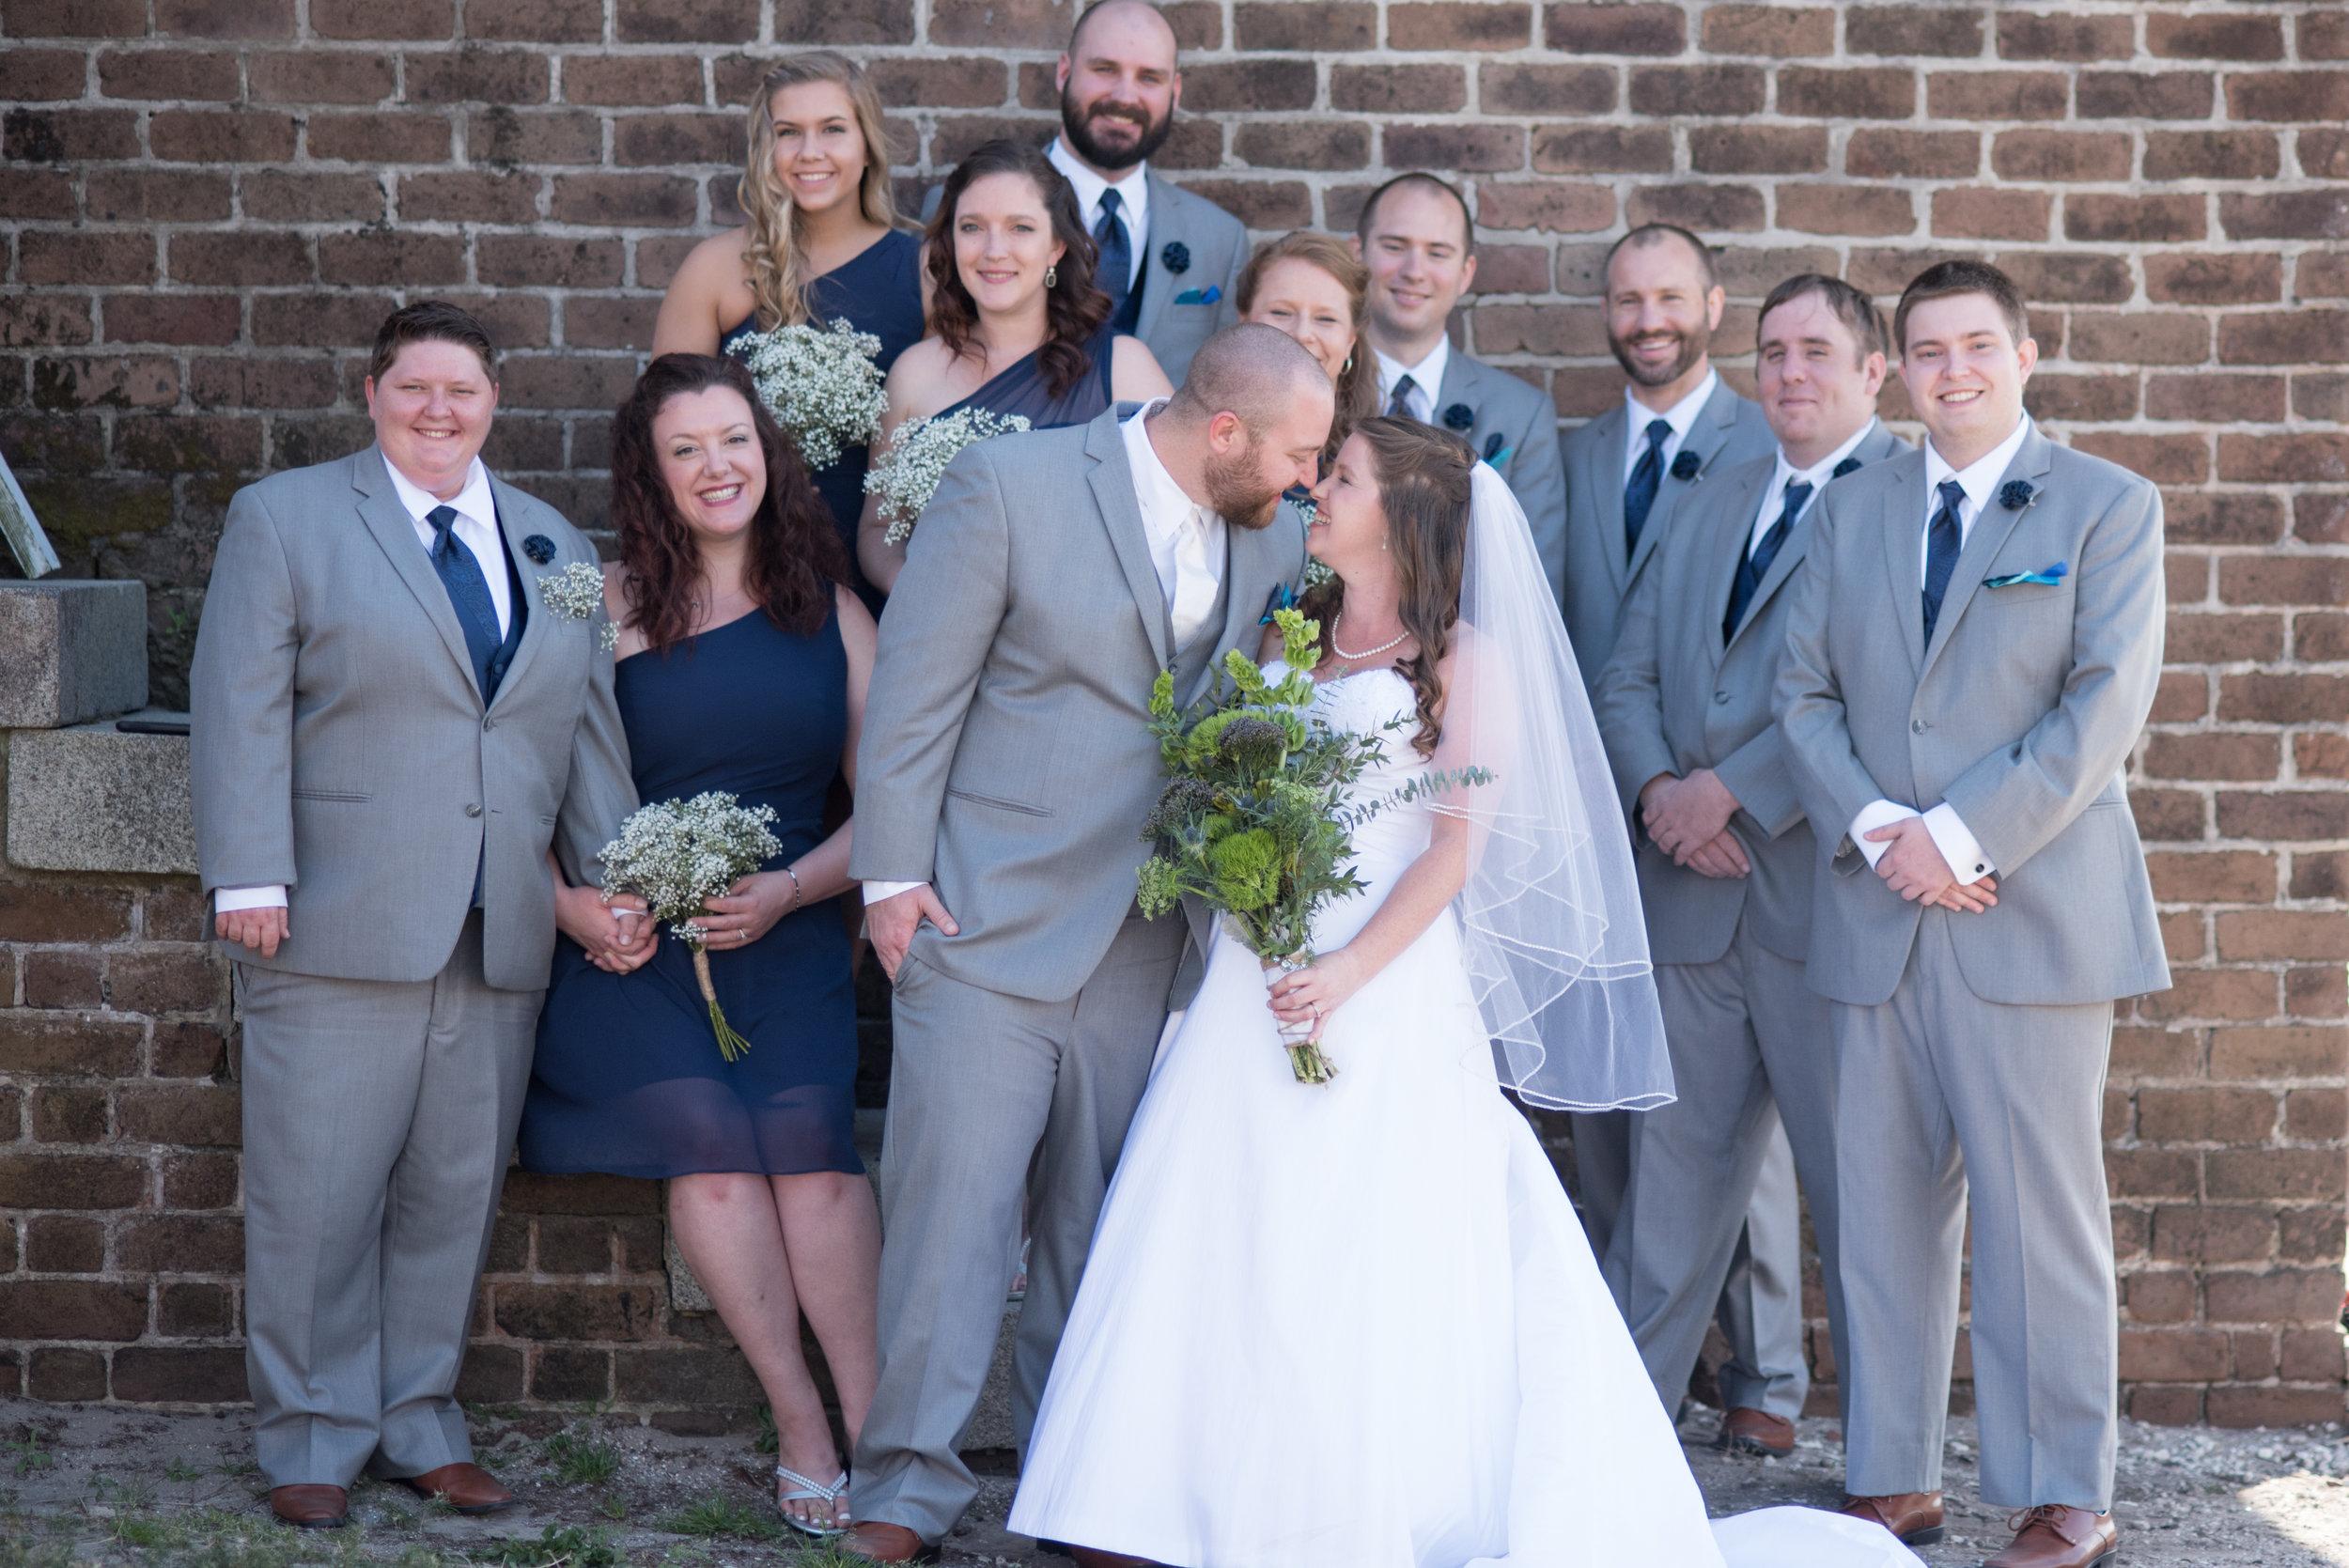 Cara + Chris wedding party